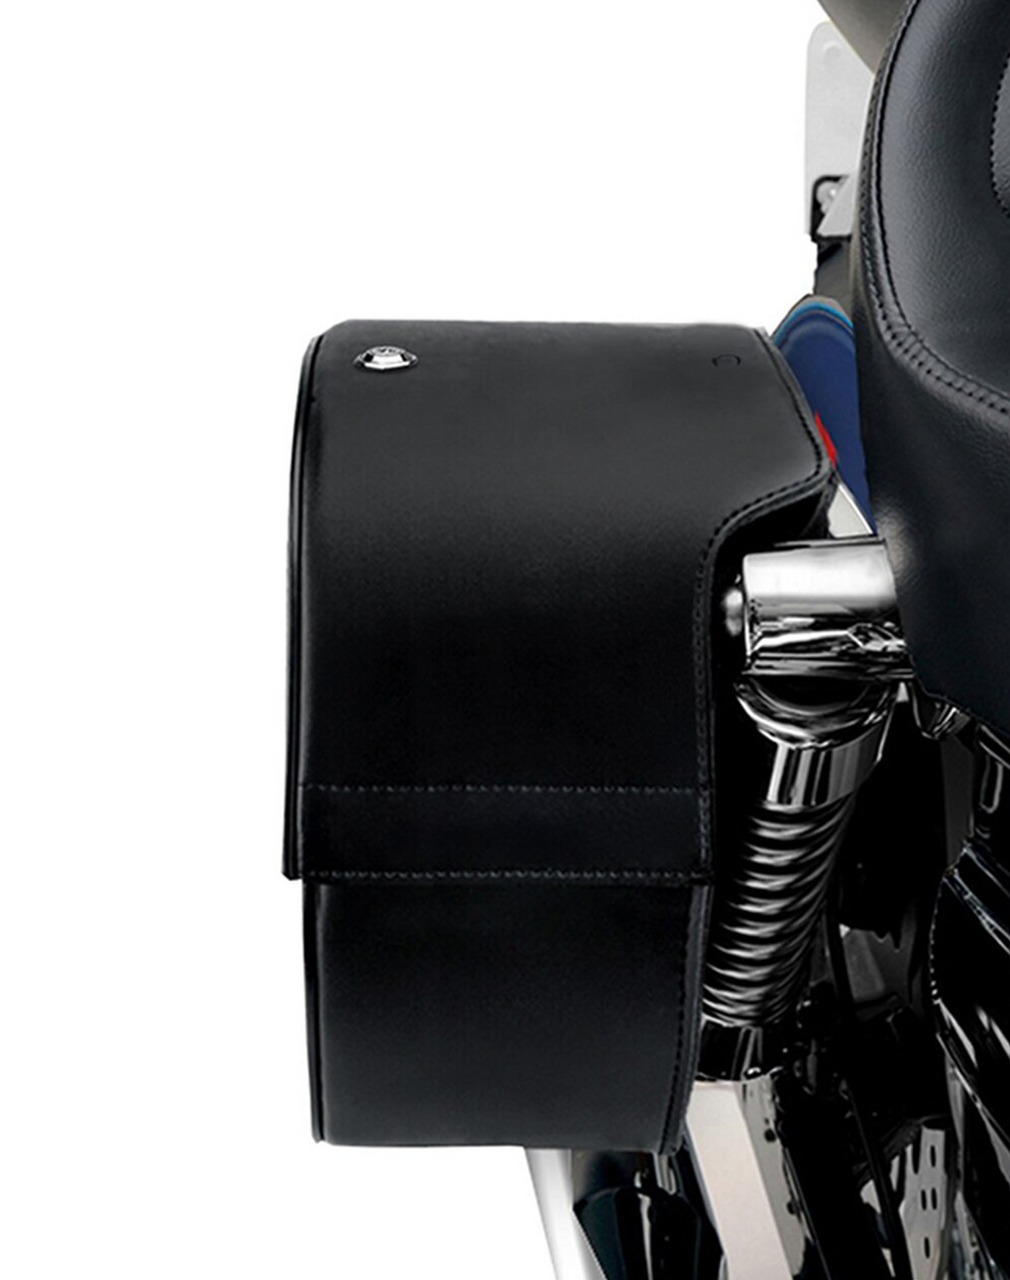 Viking Shock Cutout Slanted Large Motorcycle Saddlebags For Harley Street 750 Shock Cutout View